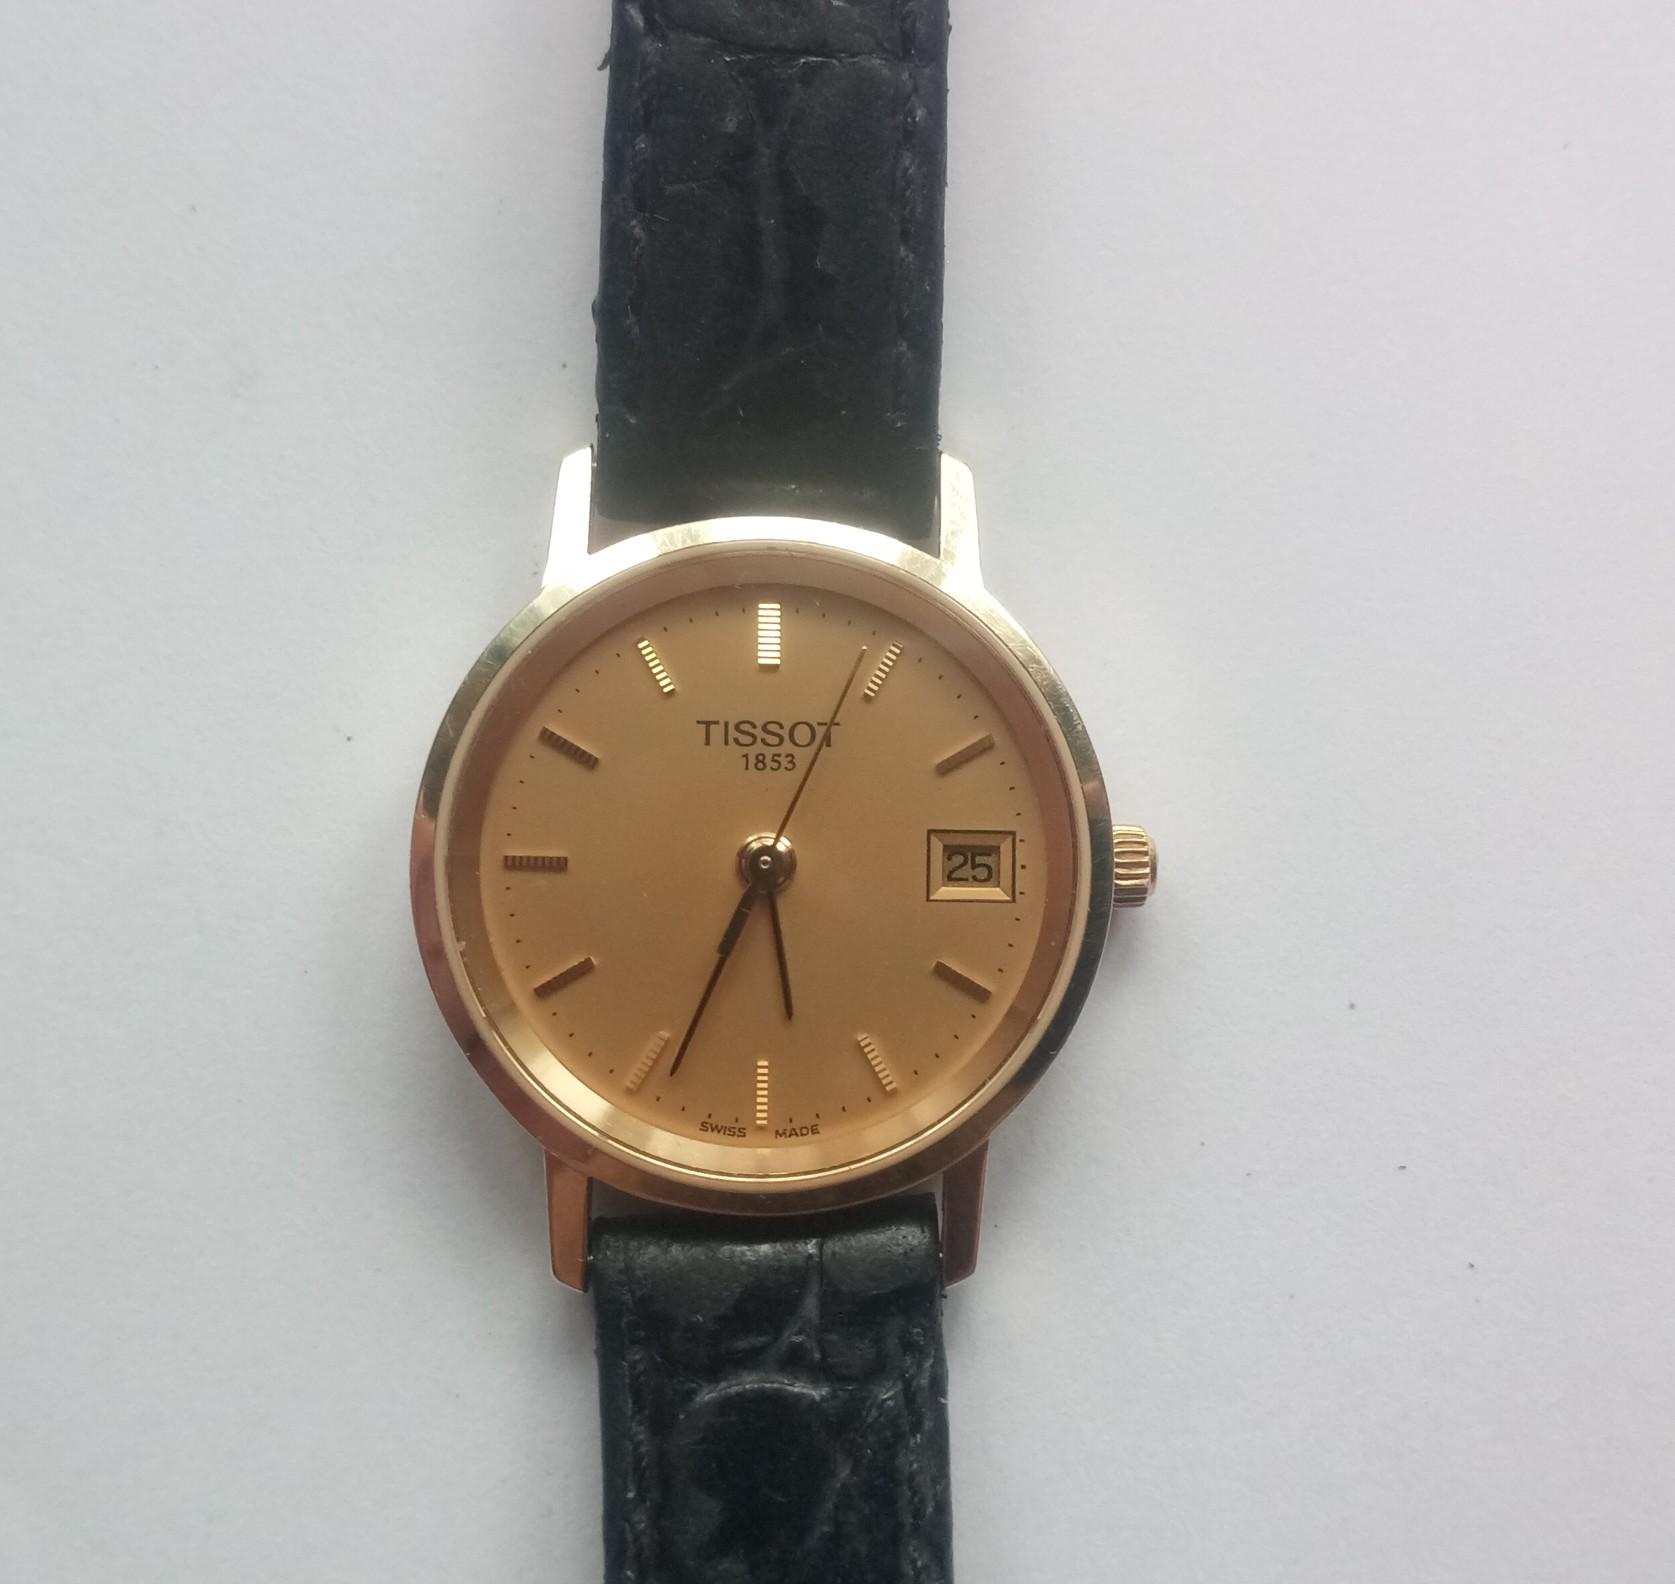 часы Tissot TISSOT GOLDRUN LADY SAPPHIRE